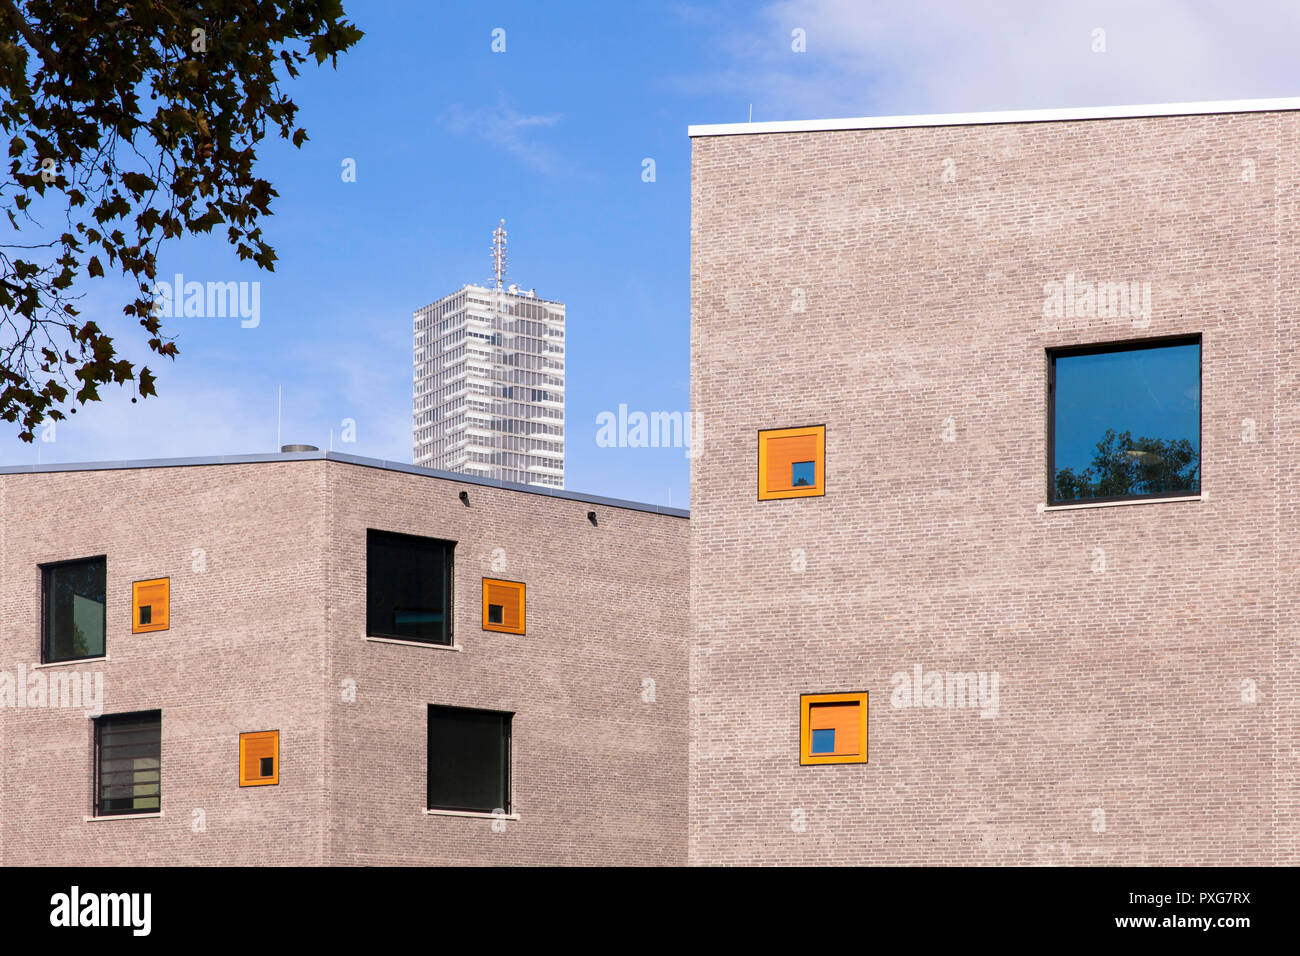 building of the school campus Bildungslandschaft Altstadt Nord (BAN) near the Klingelpuetz park, architect Gernot Schulz, in the background the Cologn - Stock Image